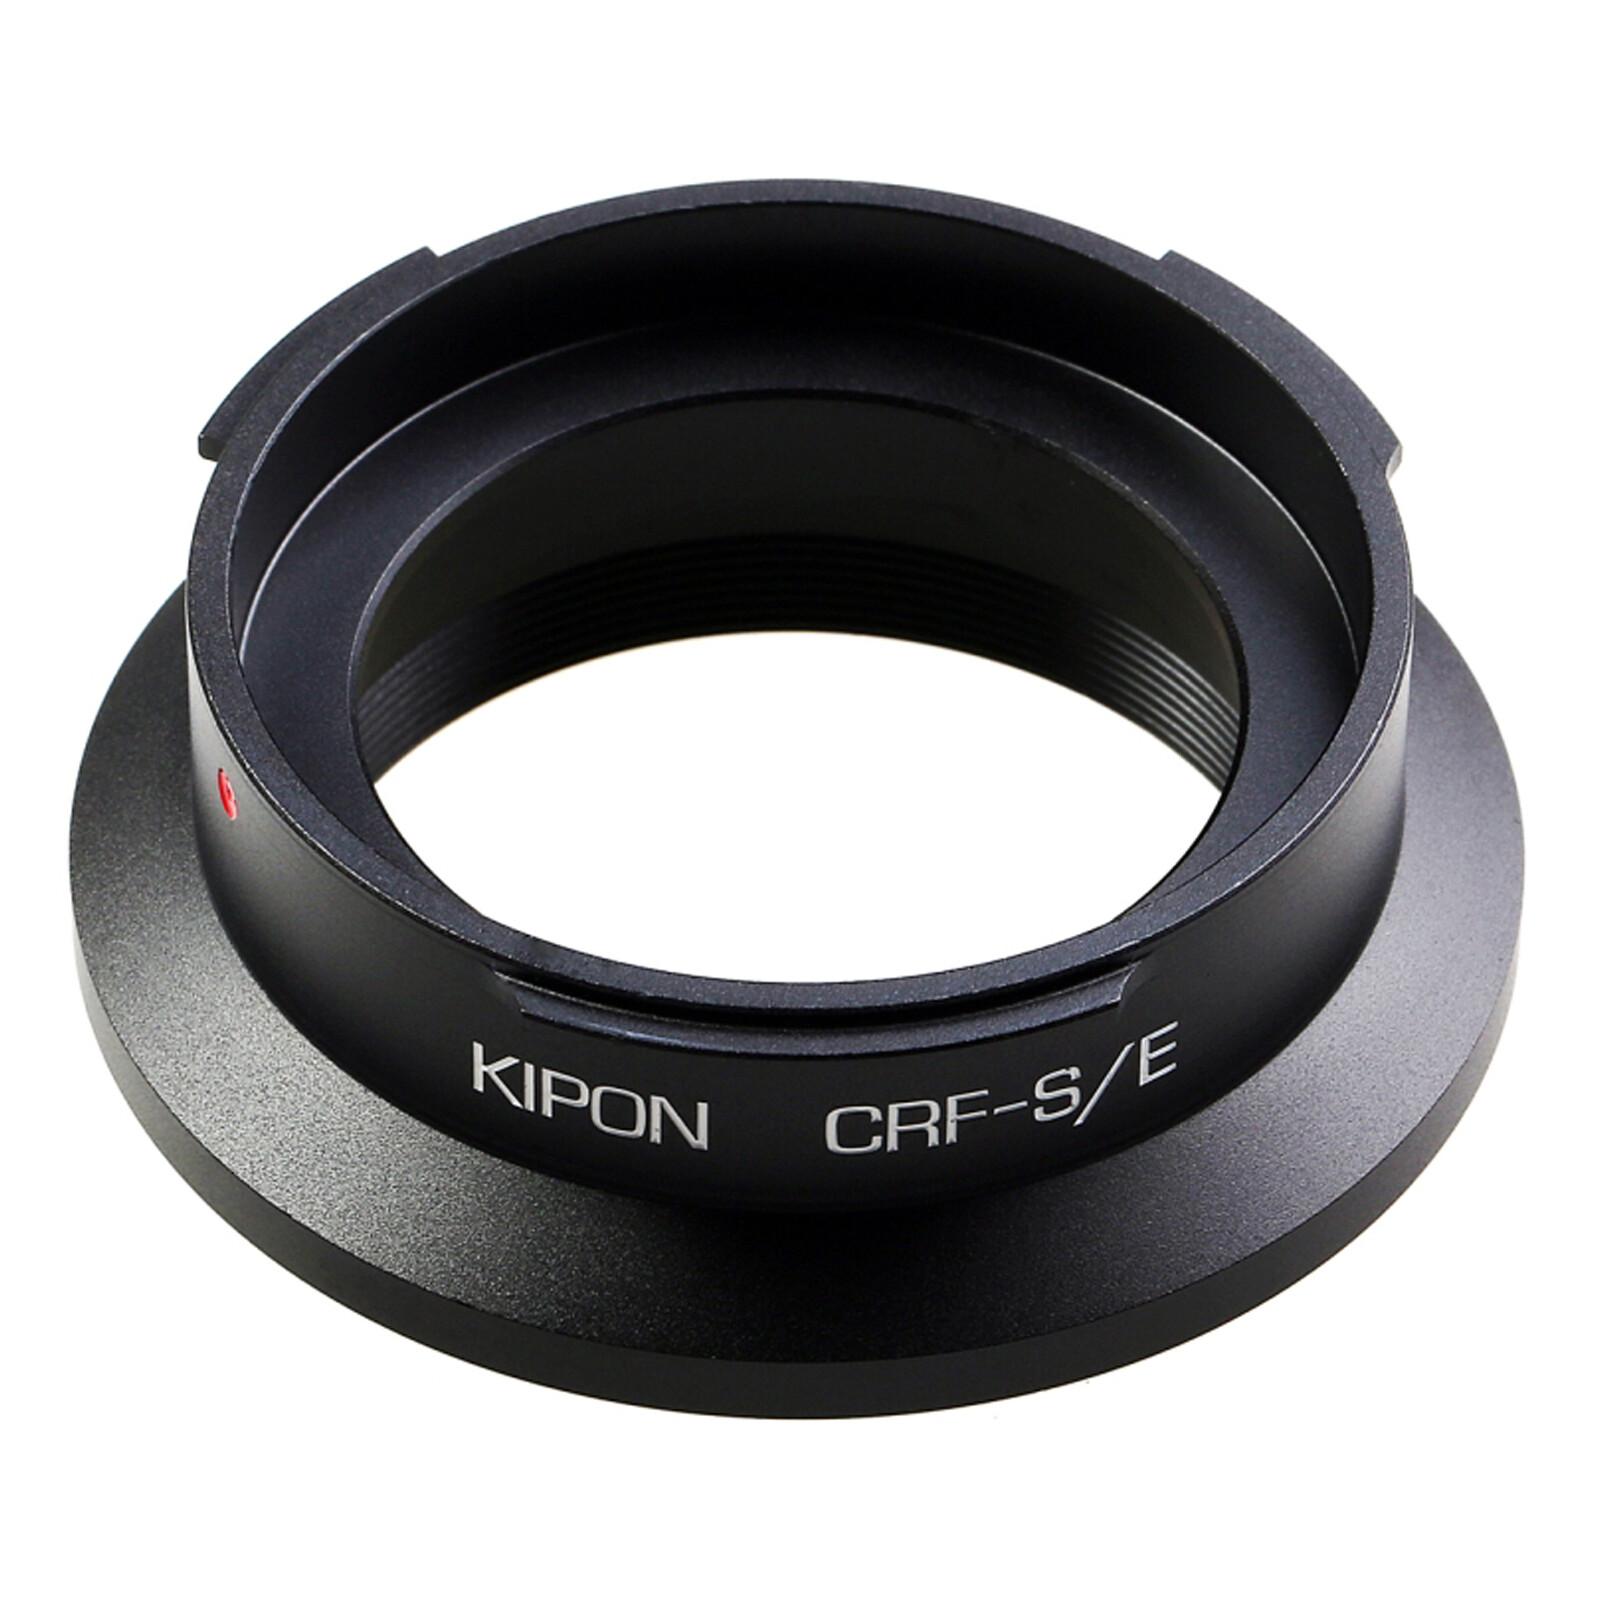 Kipon Adapter für Contax RF auf Sony E